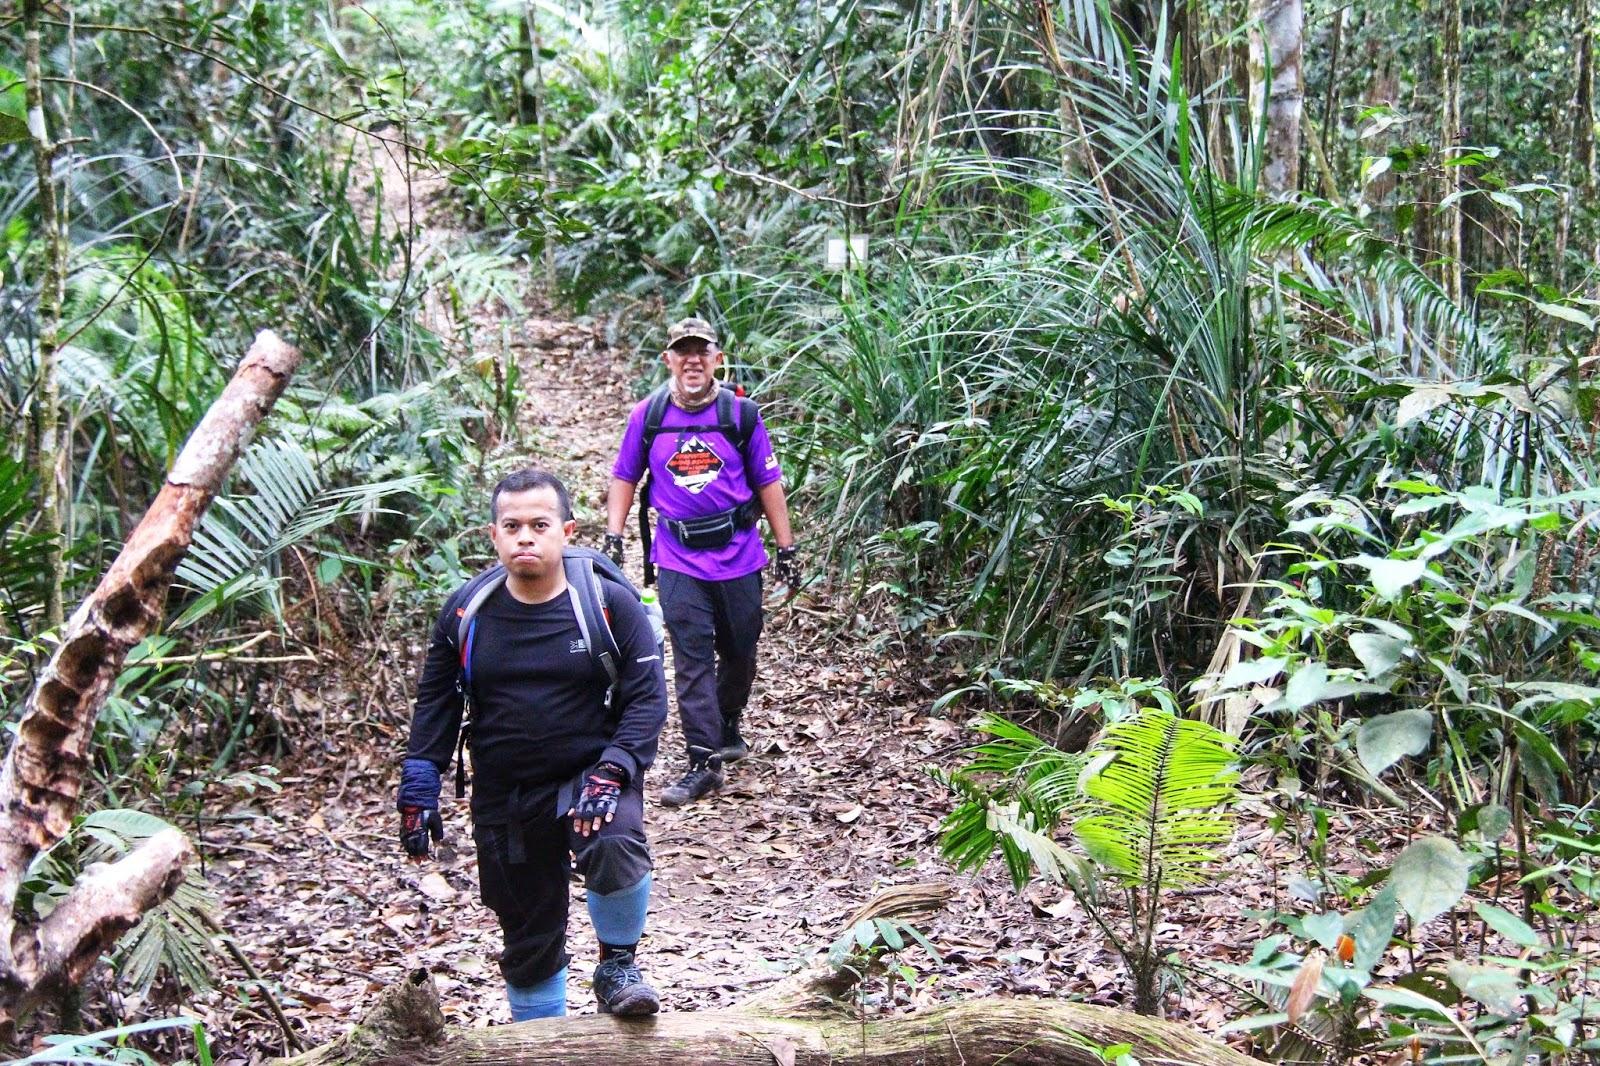 Menuju ke puncak Gunung Berembun 4